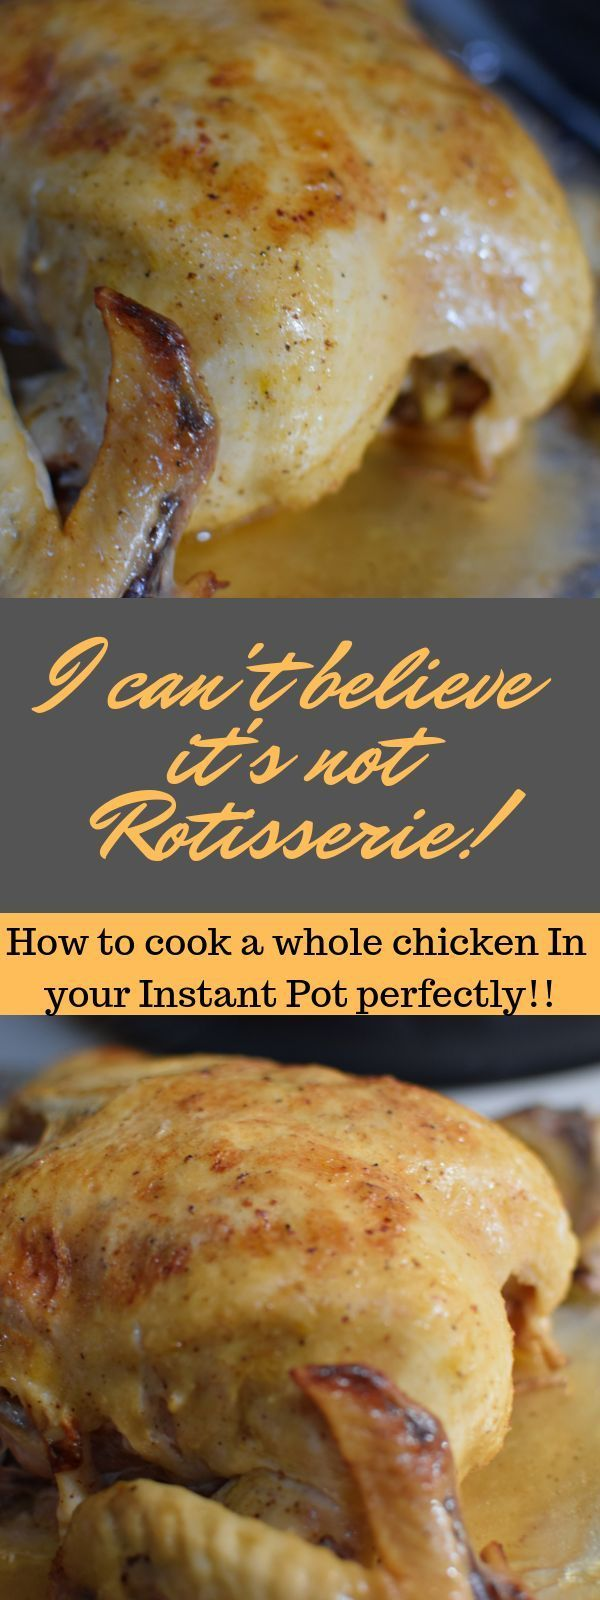 HEALTHY INSTANT POT CHICKEN RECIPE #instantpotchickenrecipes